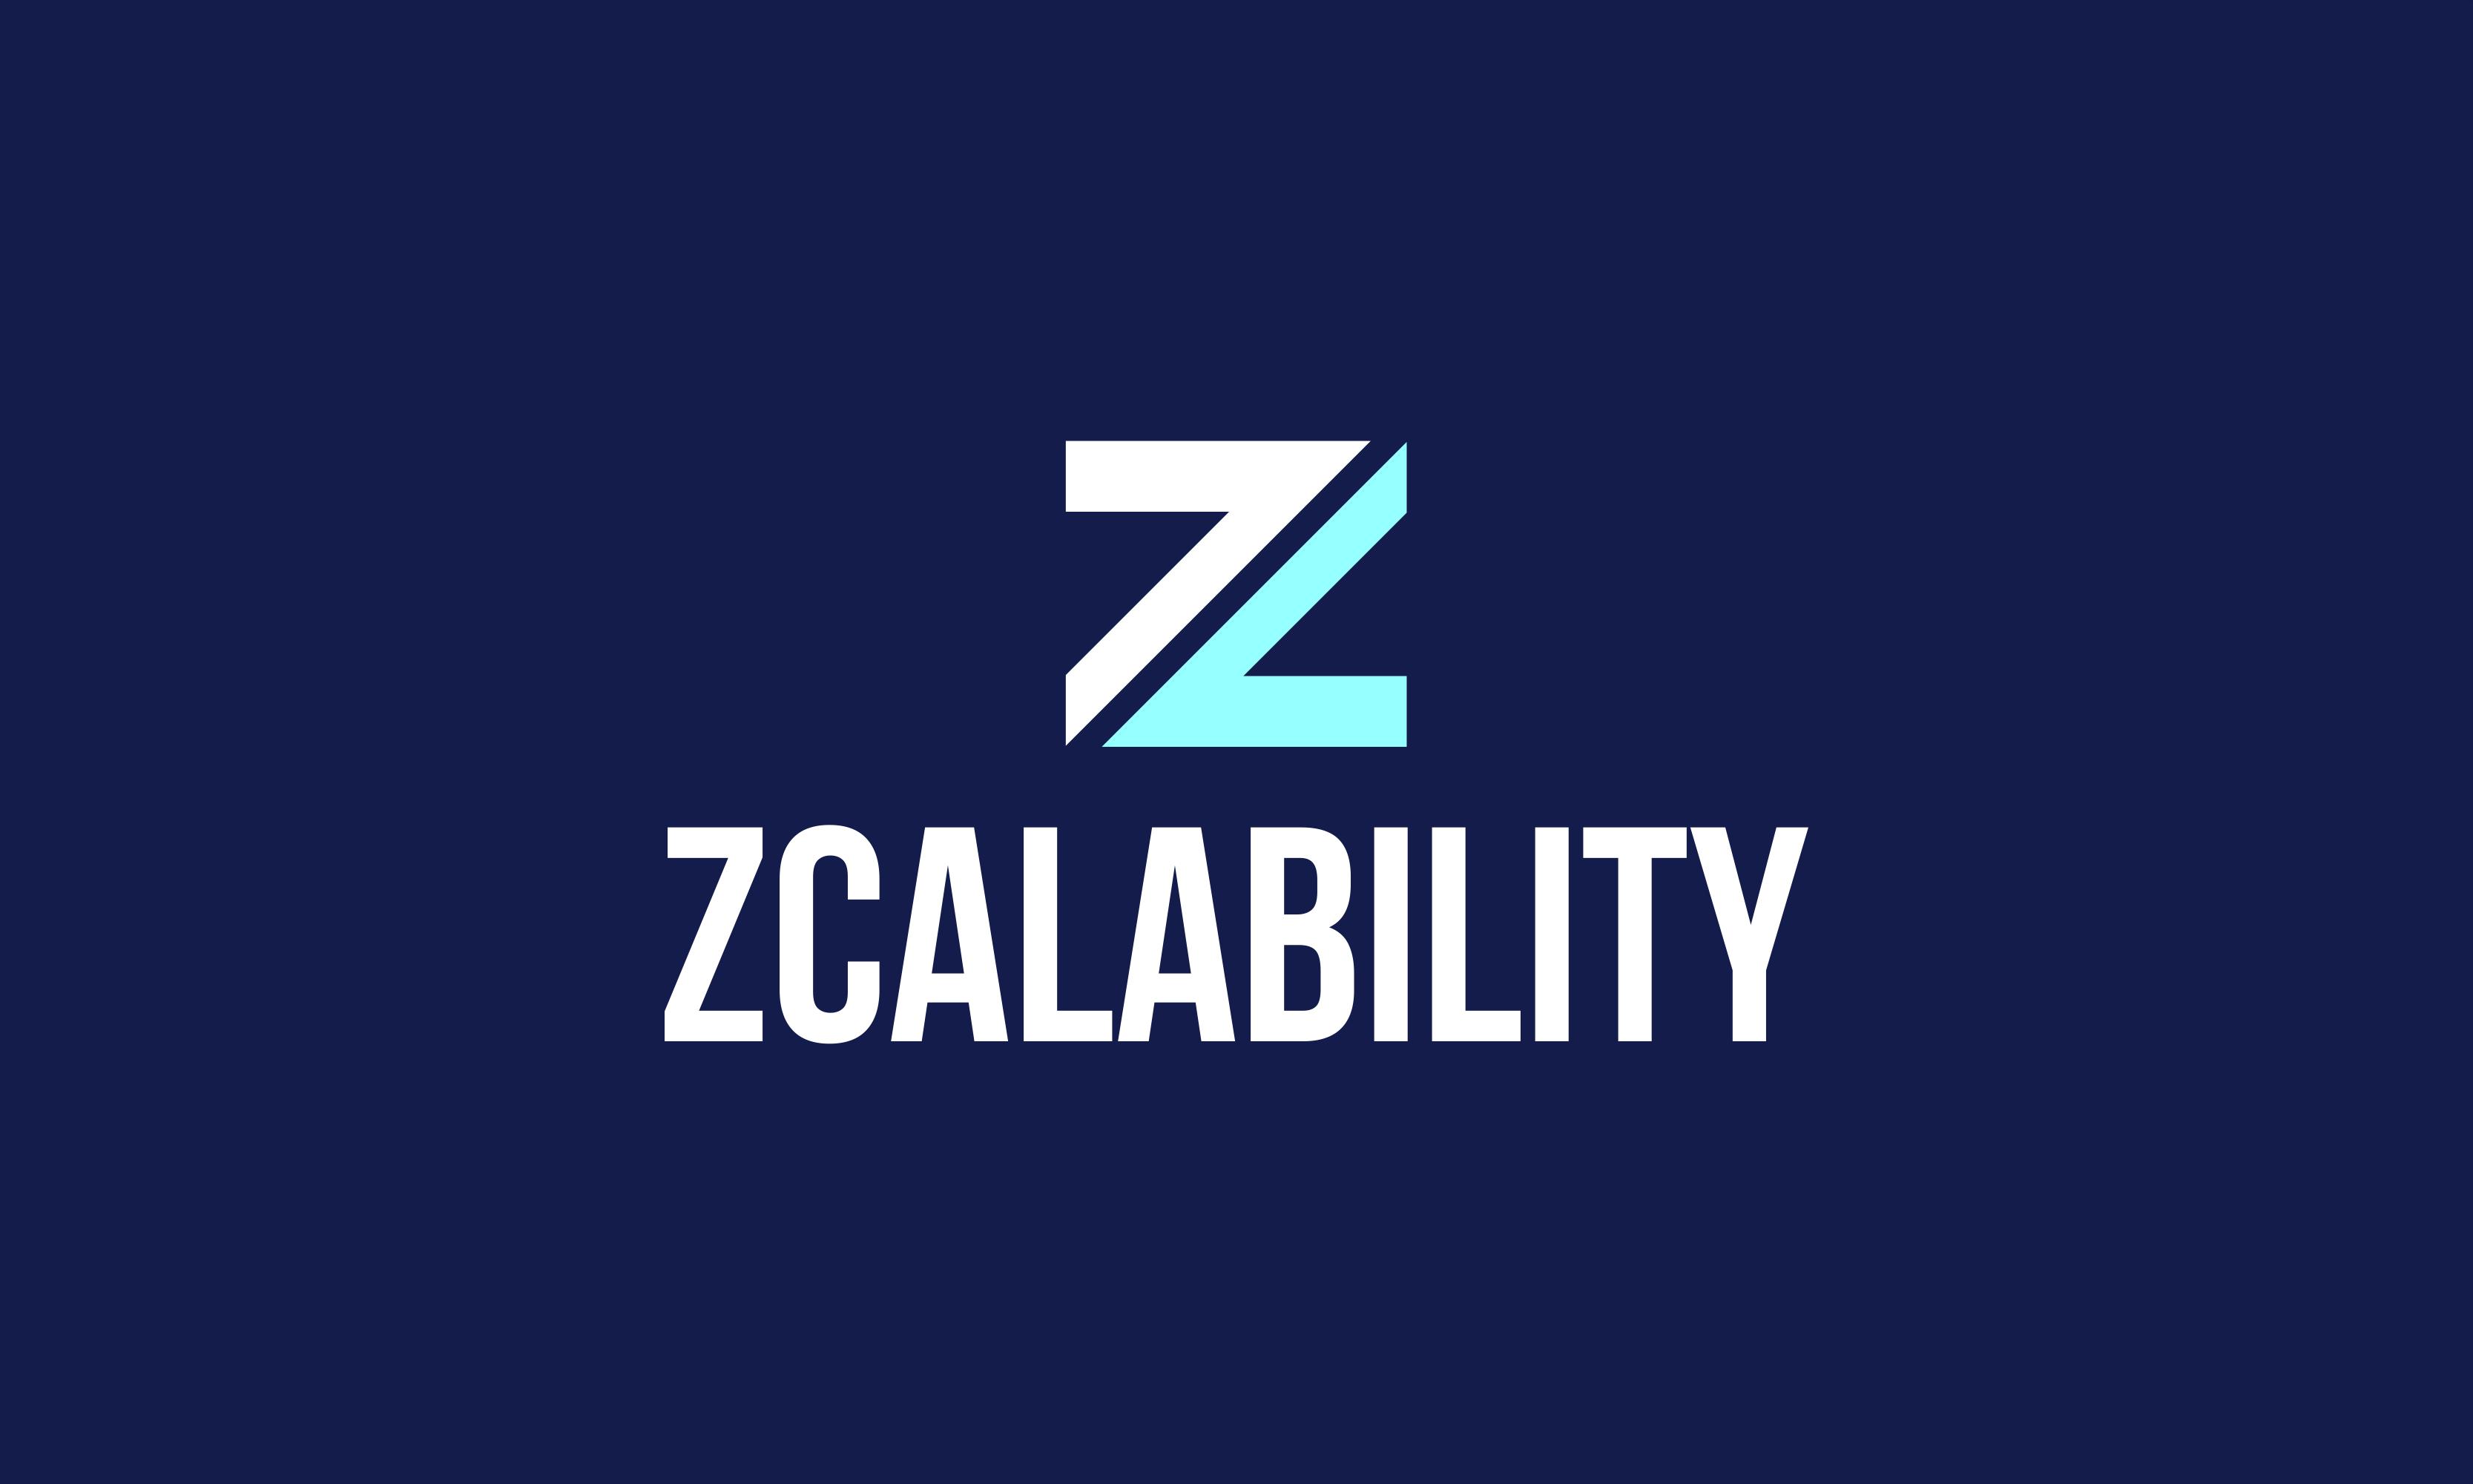 Zcalability